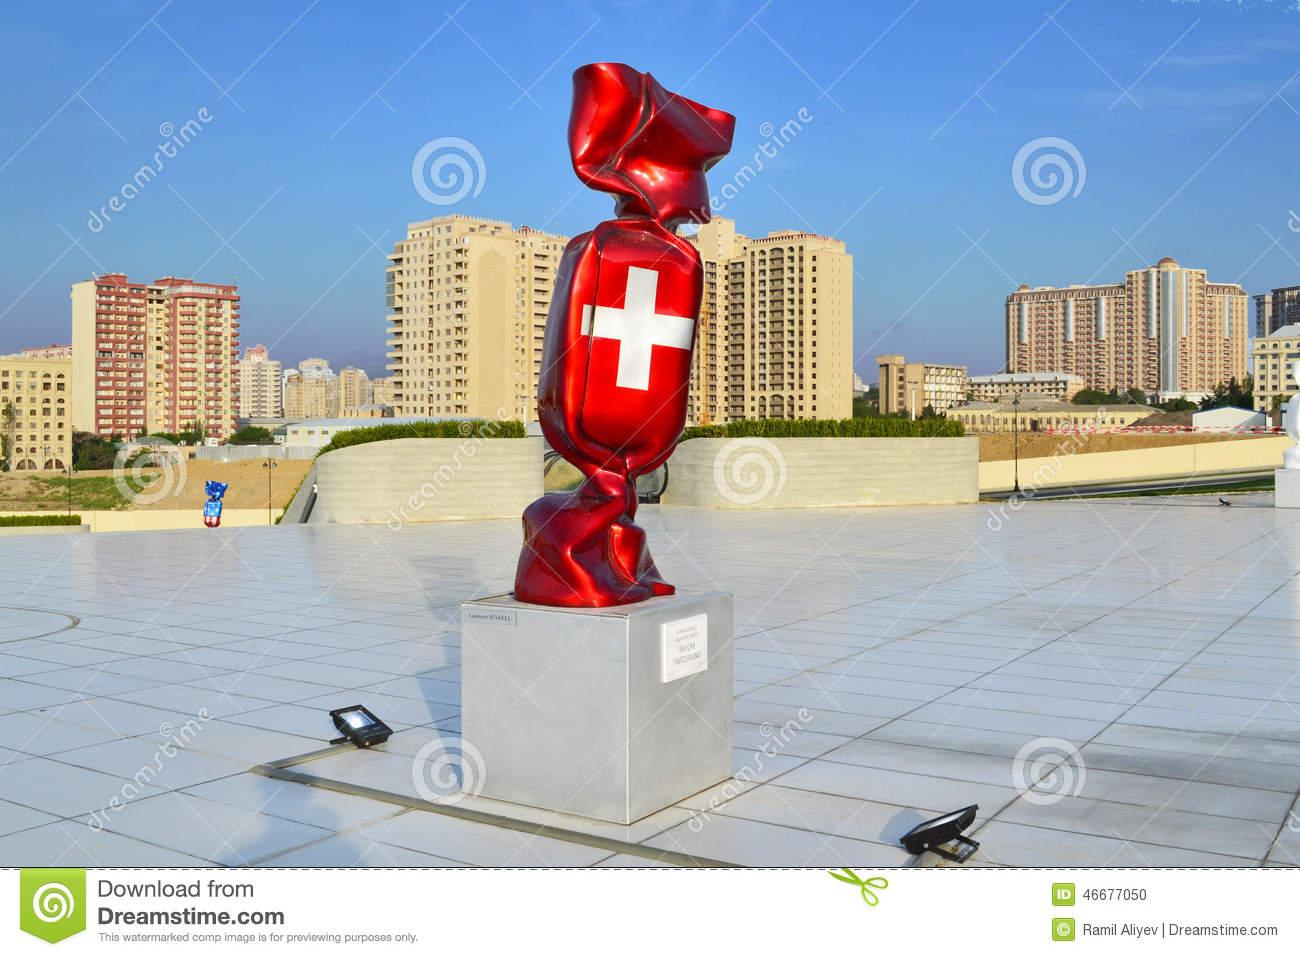 ф аг швейцарии